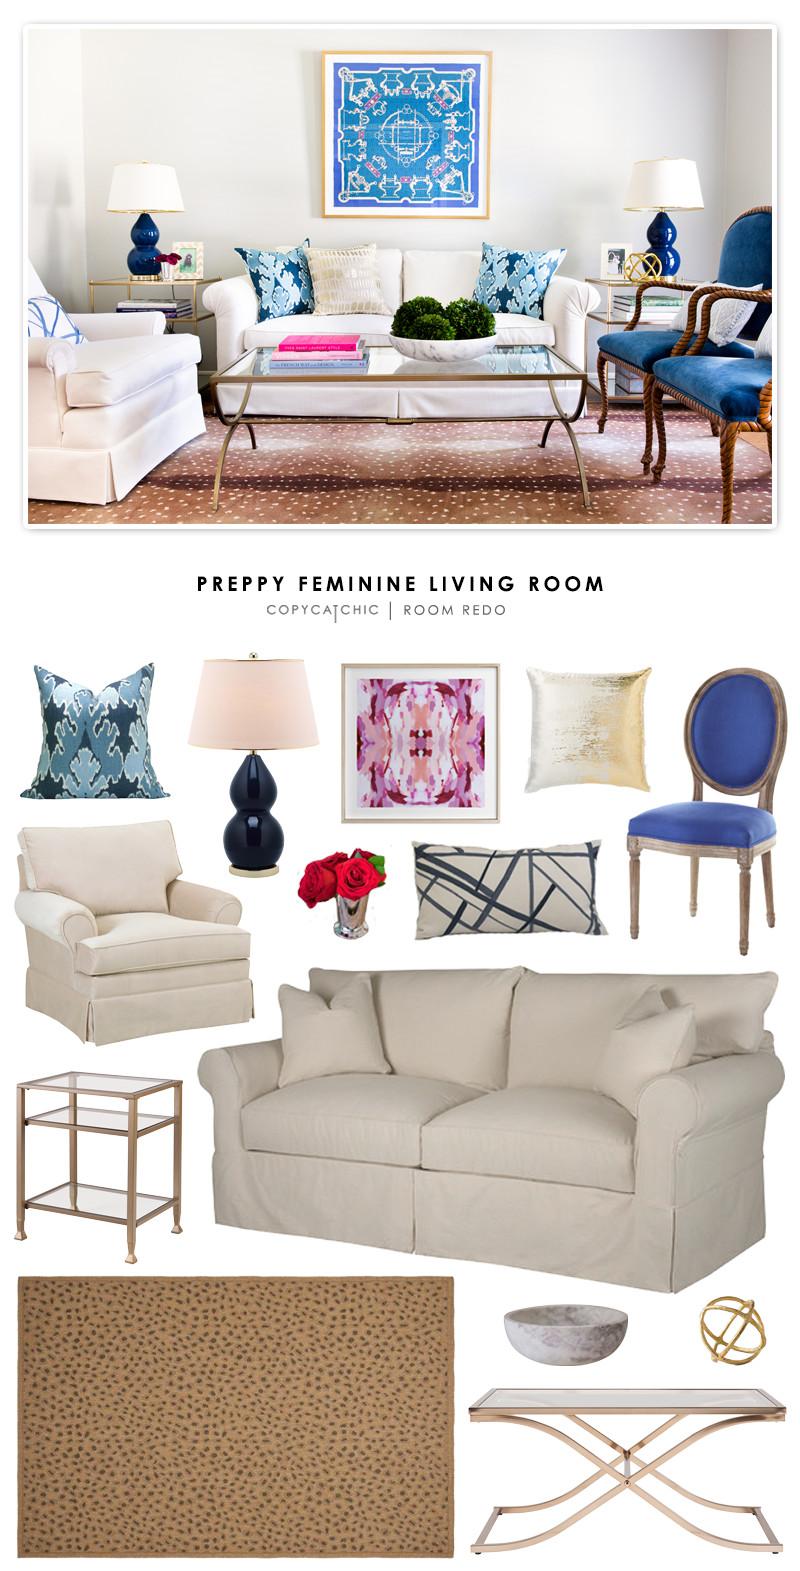 Comfortable Feminine Living Room Best Of Copy Cat Chic Room Redo